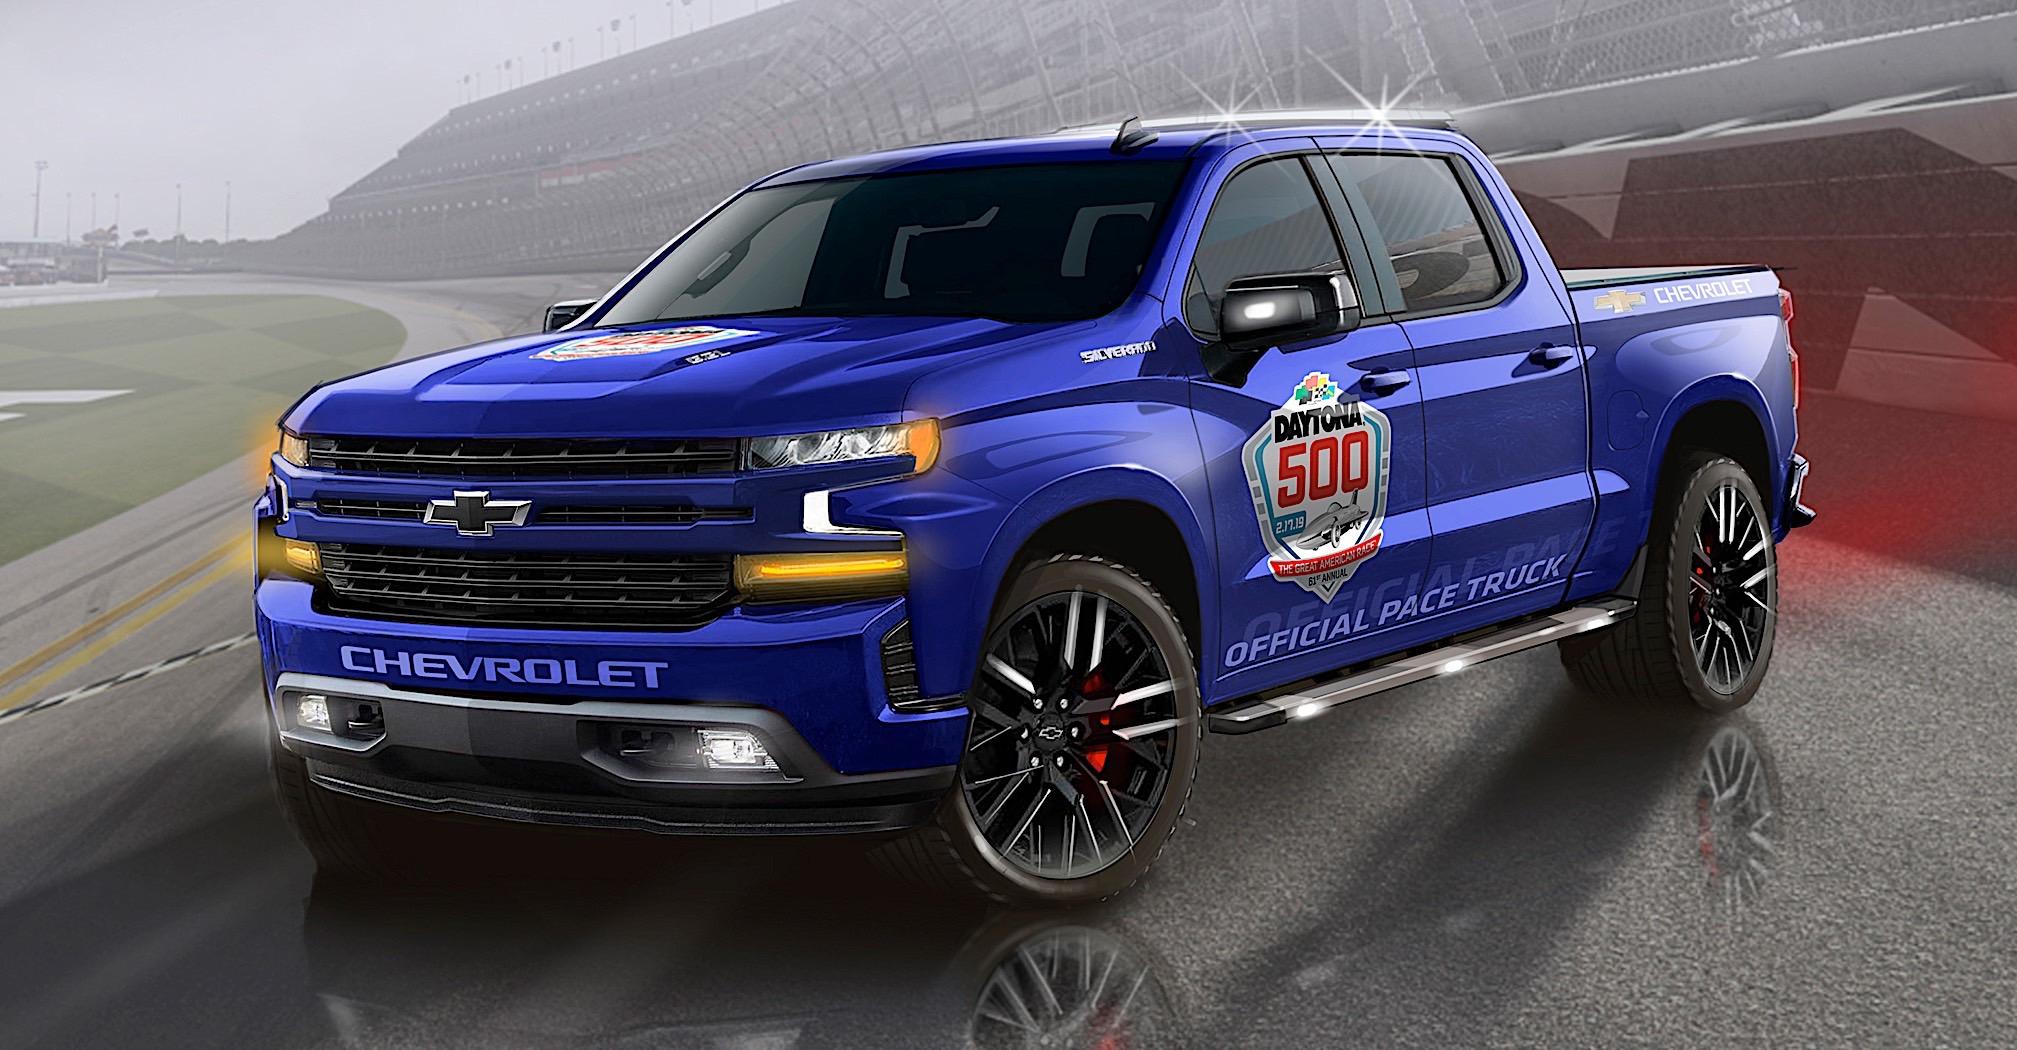 98 Modifikasi Pick Up Chevrolet 2019 Aliranmodif